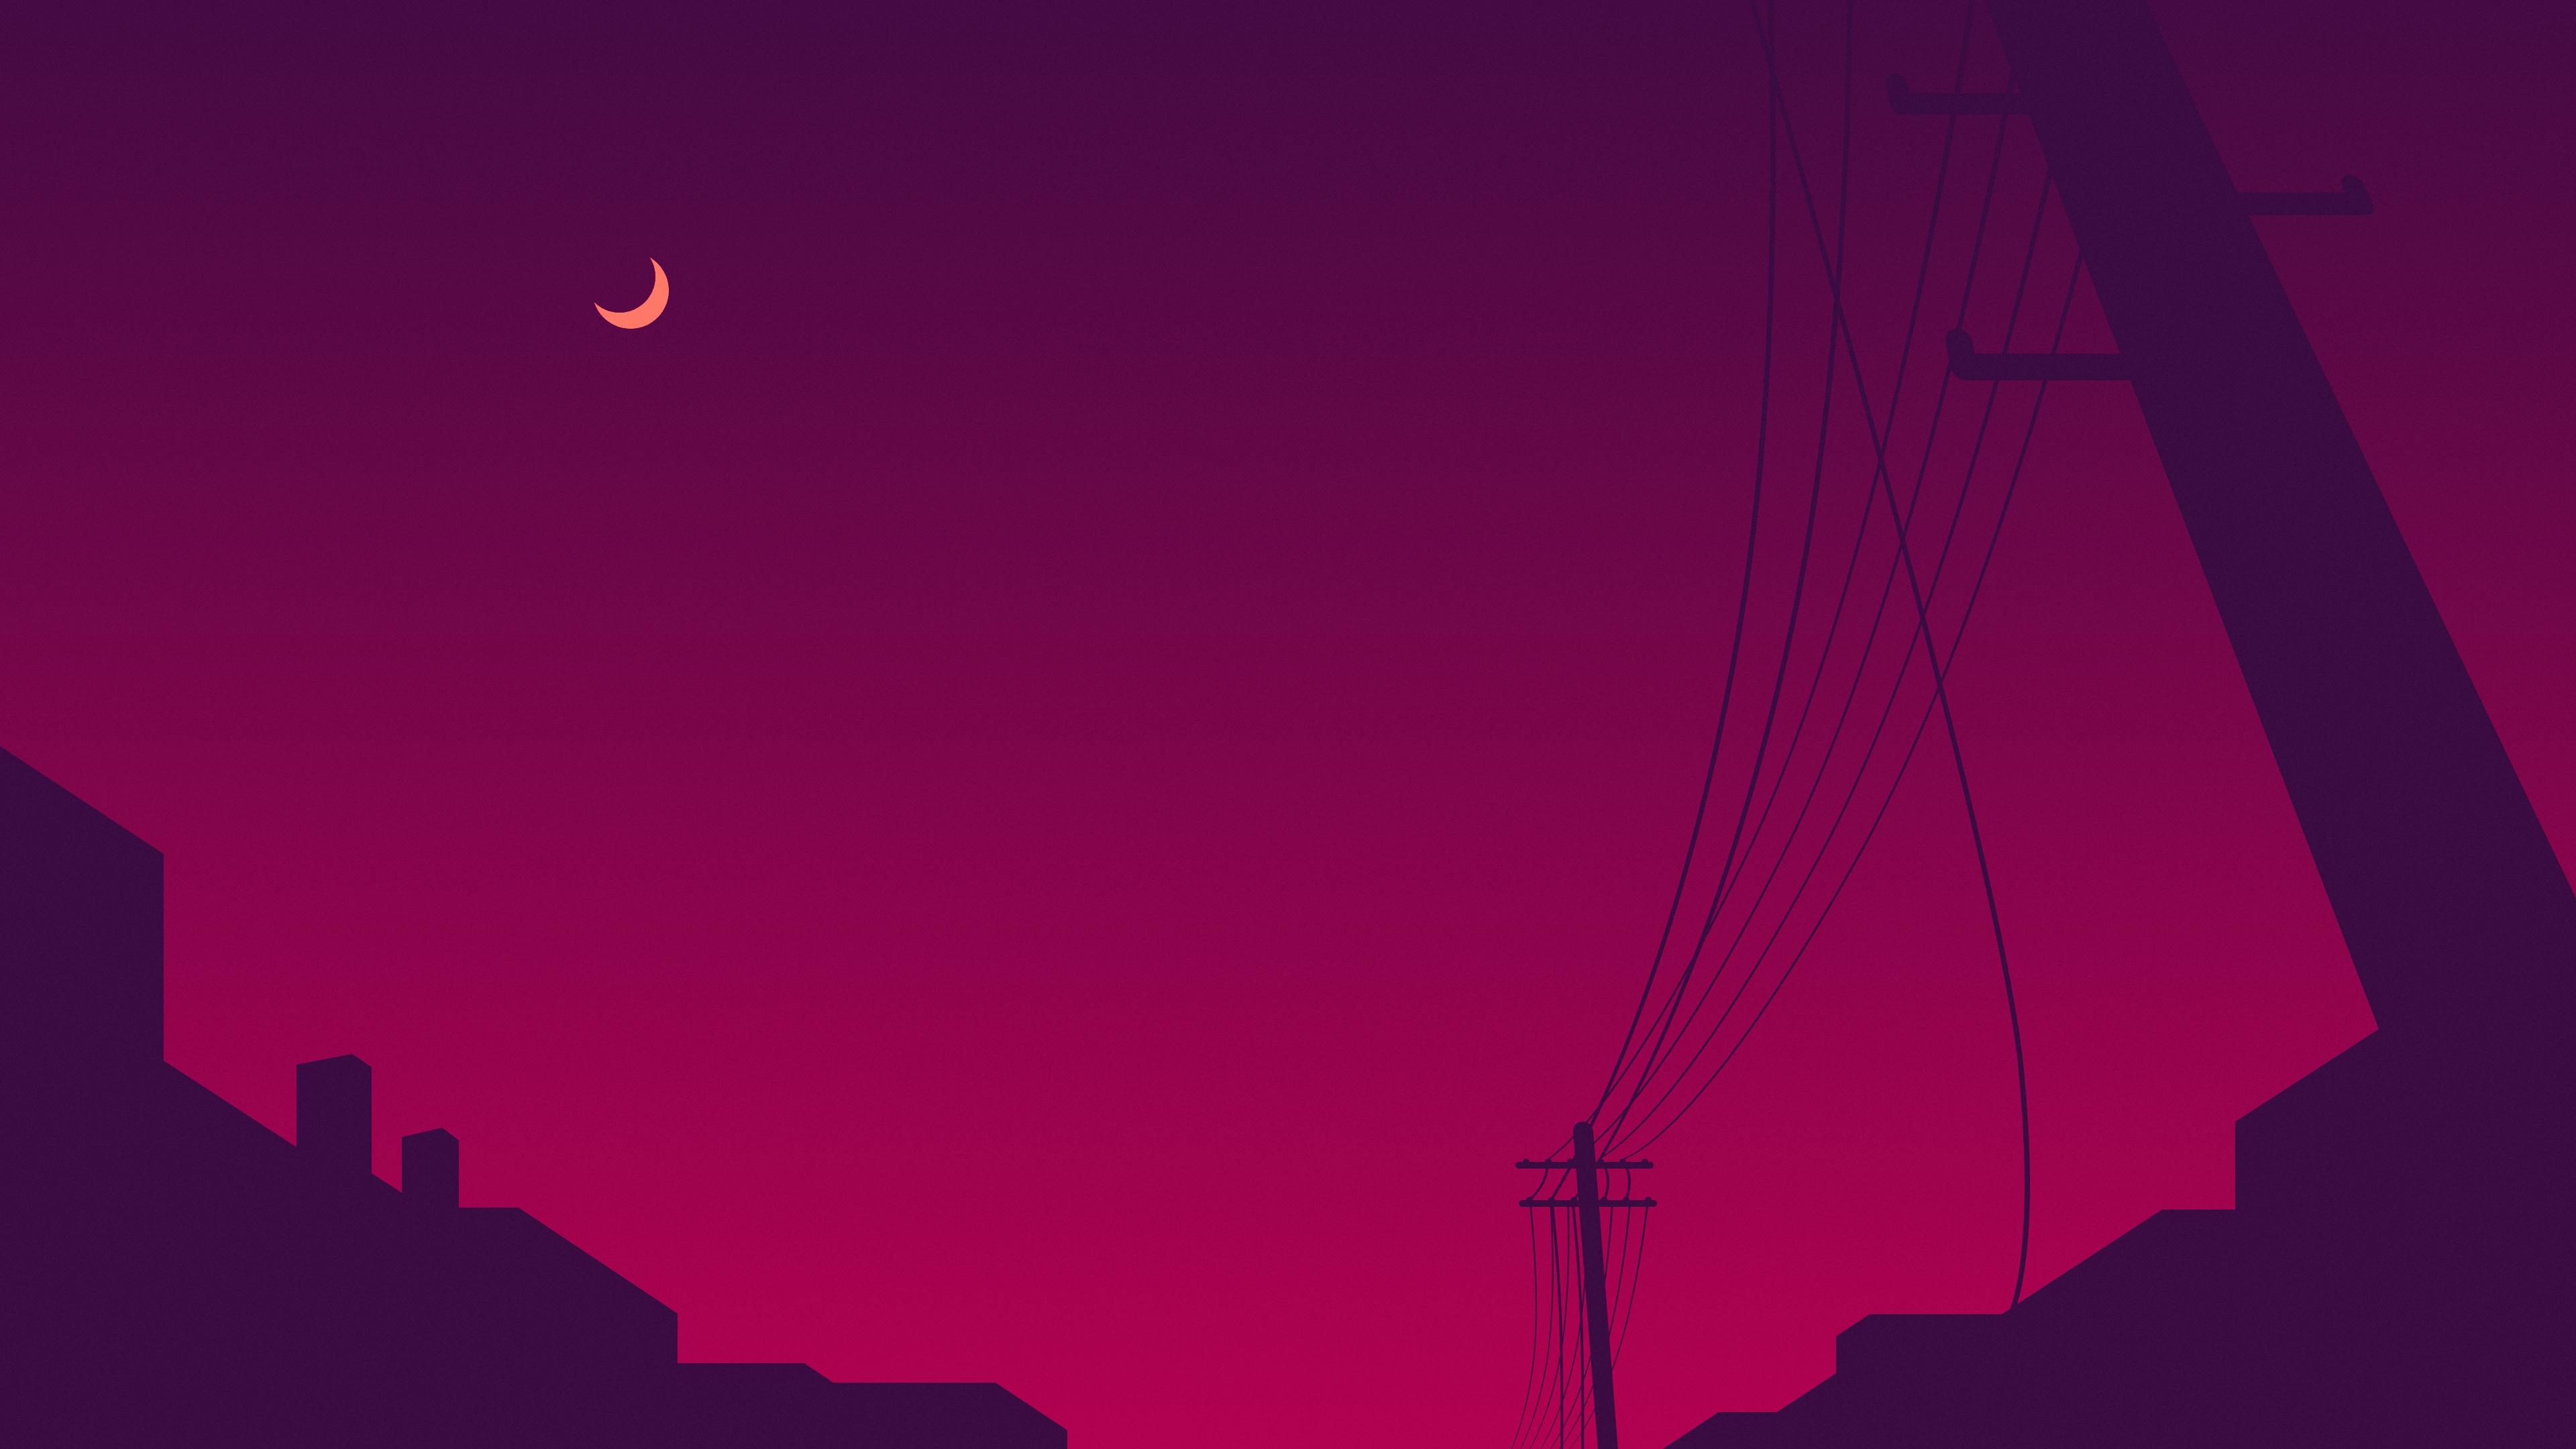 power lines moon sky minimalism 4k 1540754534 - Power Lines Moon Sky Minimalism 4k - sky wallpapers, pink wallpapers, moon wallpapers, minimalist wallpapers, minimalism wallpapers, hd-wallpapers, digital art wallpapers, artwork wallpapers, artist wallpapers, 4k-wallpapers